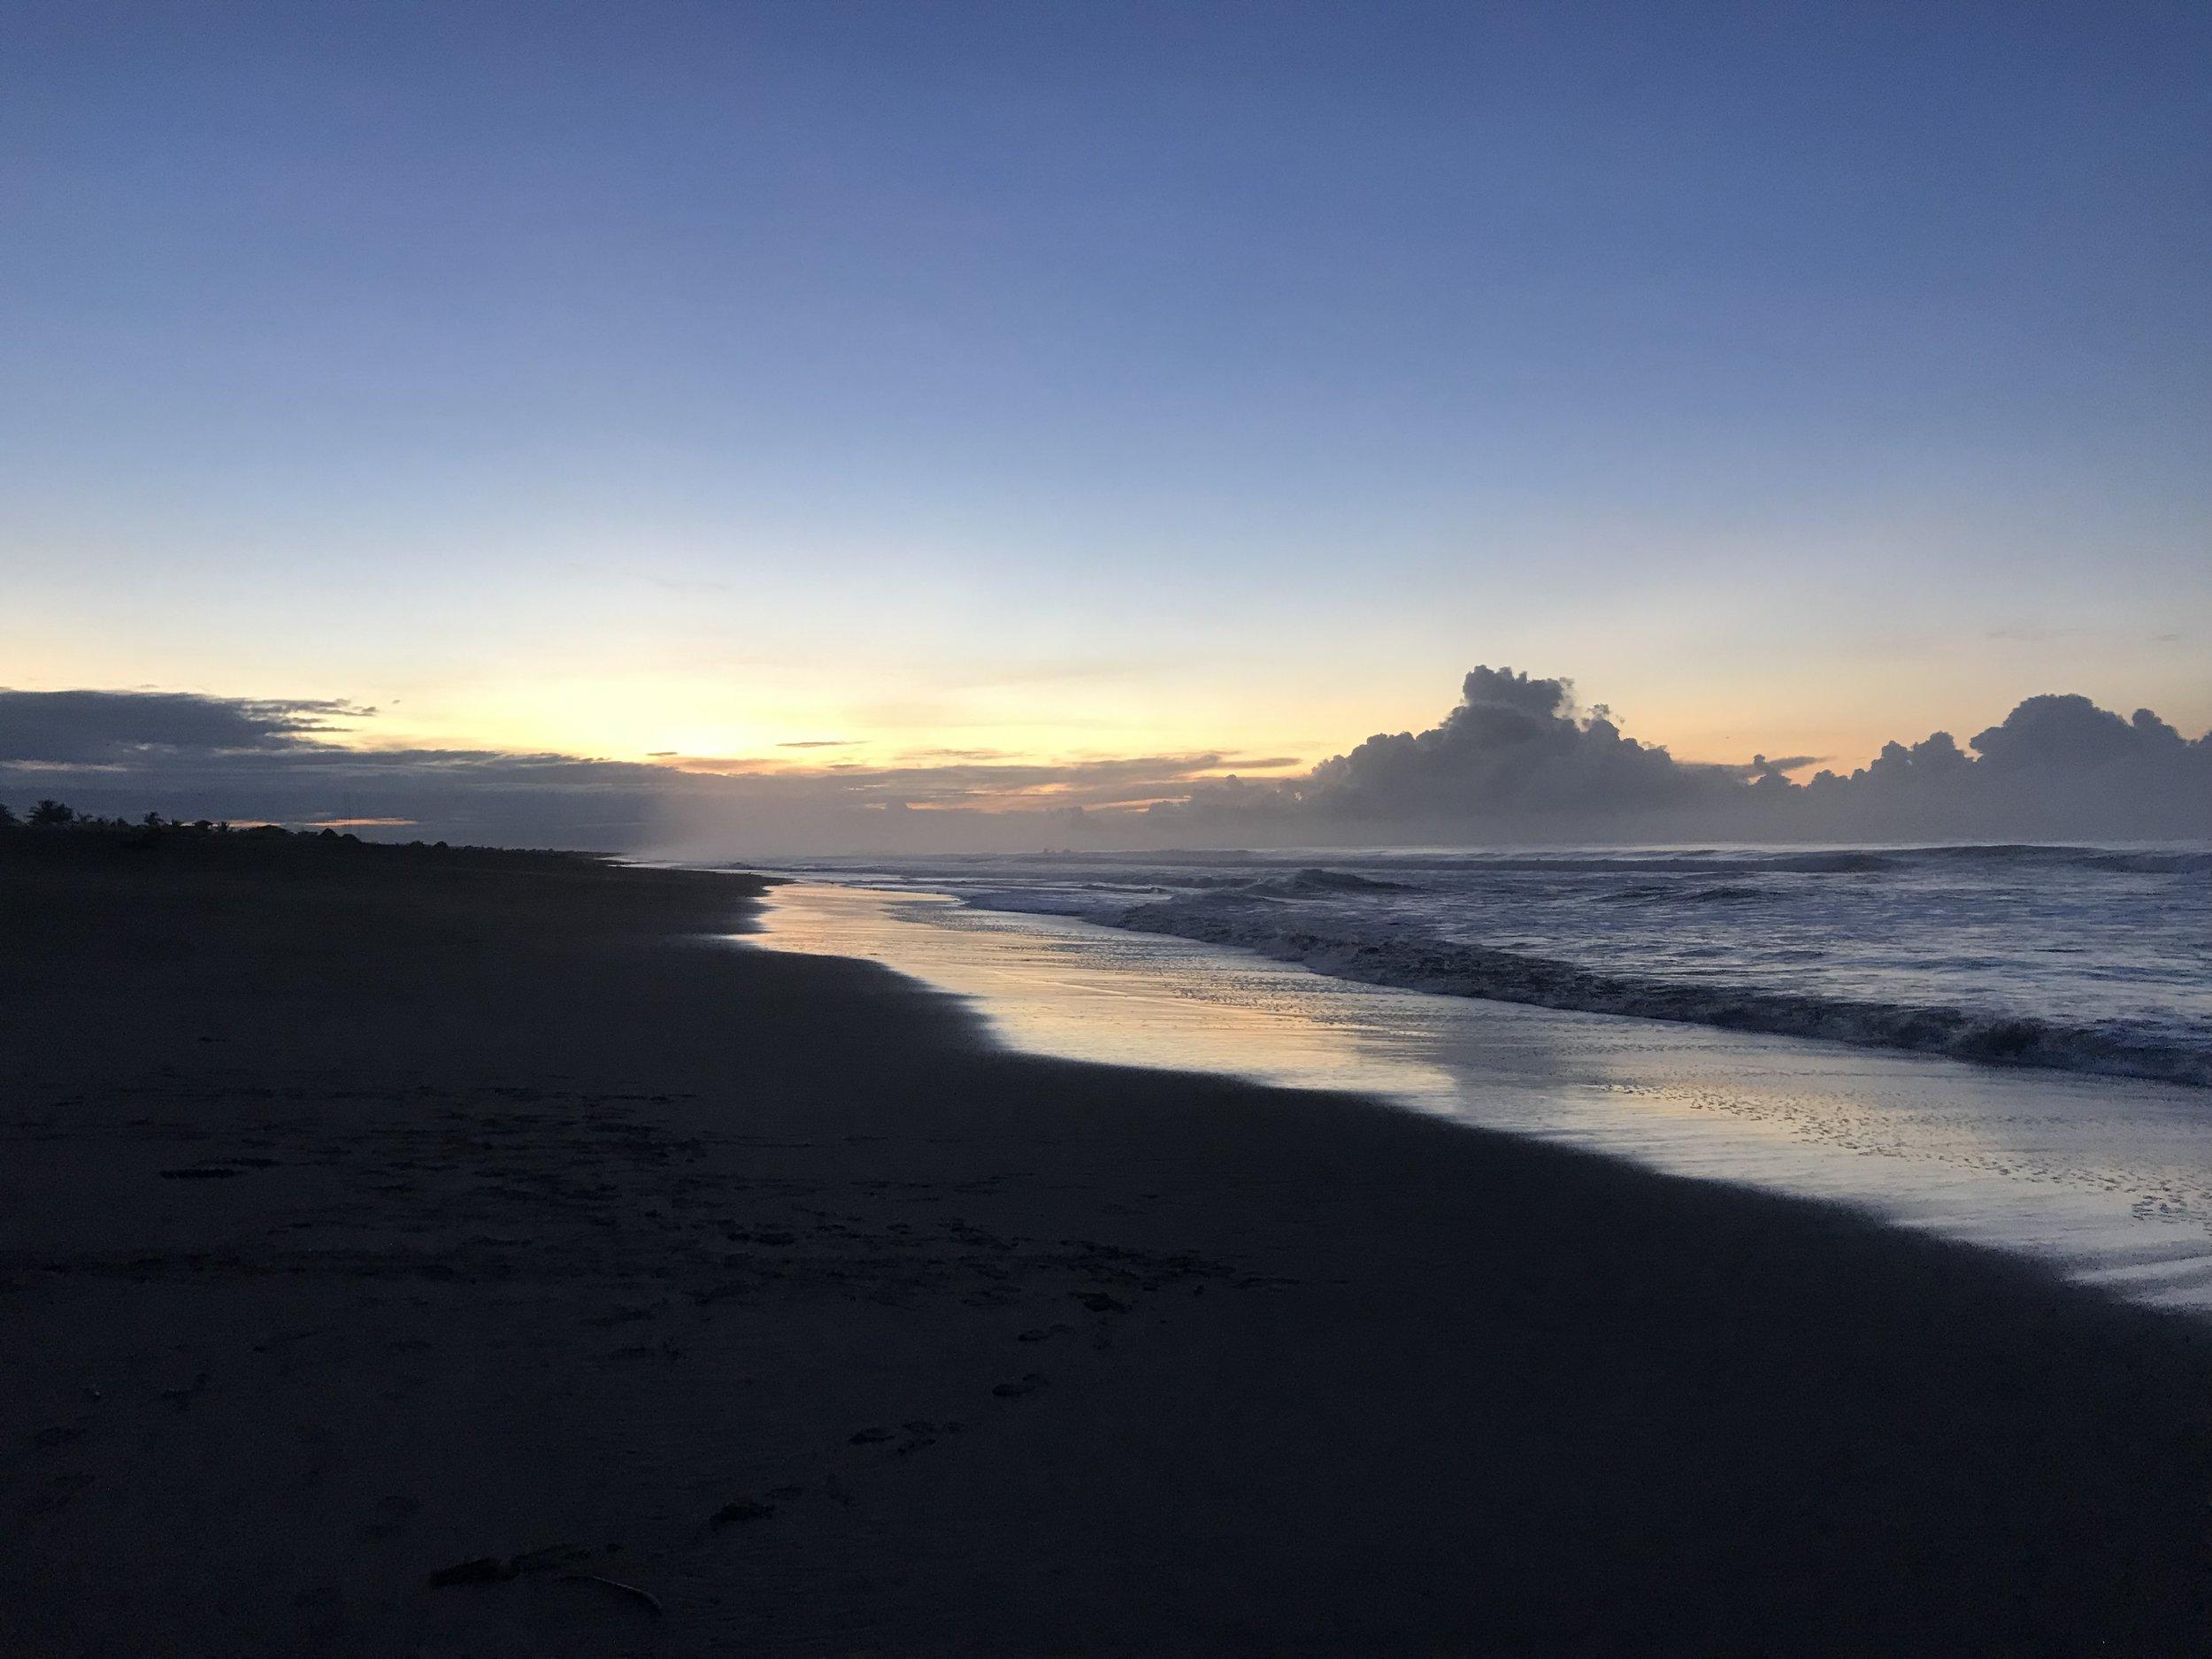 Sunrise of the first day of Panama Coast to Coast